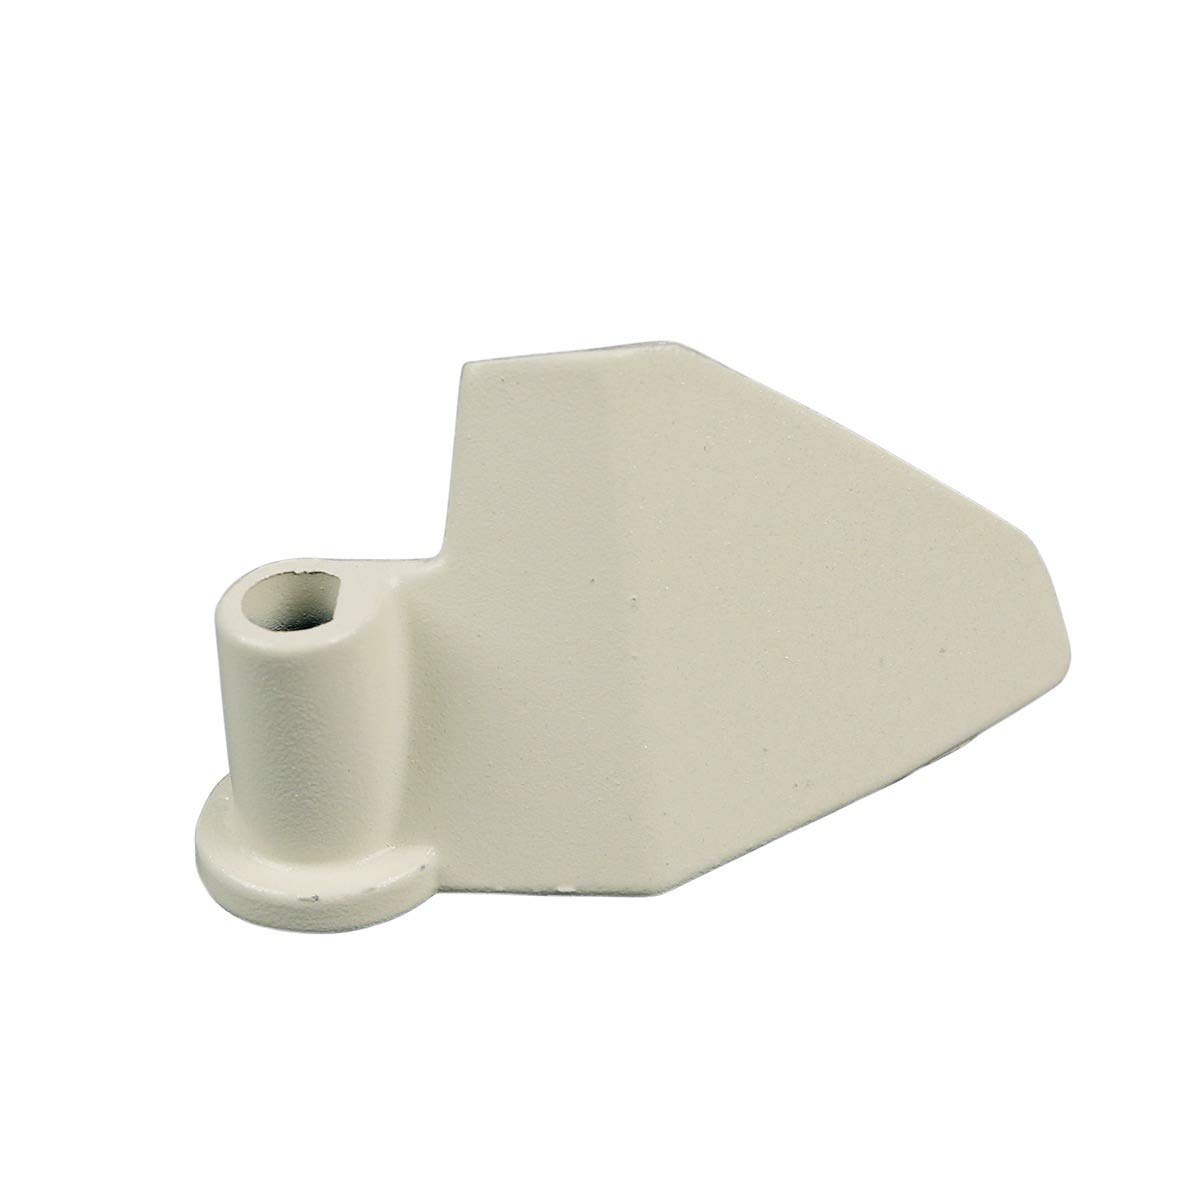 K-St. - Pala amasadora recubierta de cerámica para panificadoras automáticas Unold, Backmeister